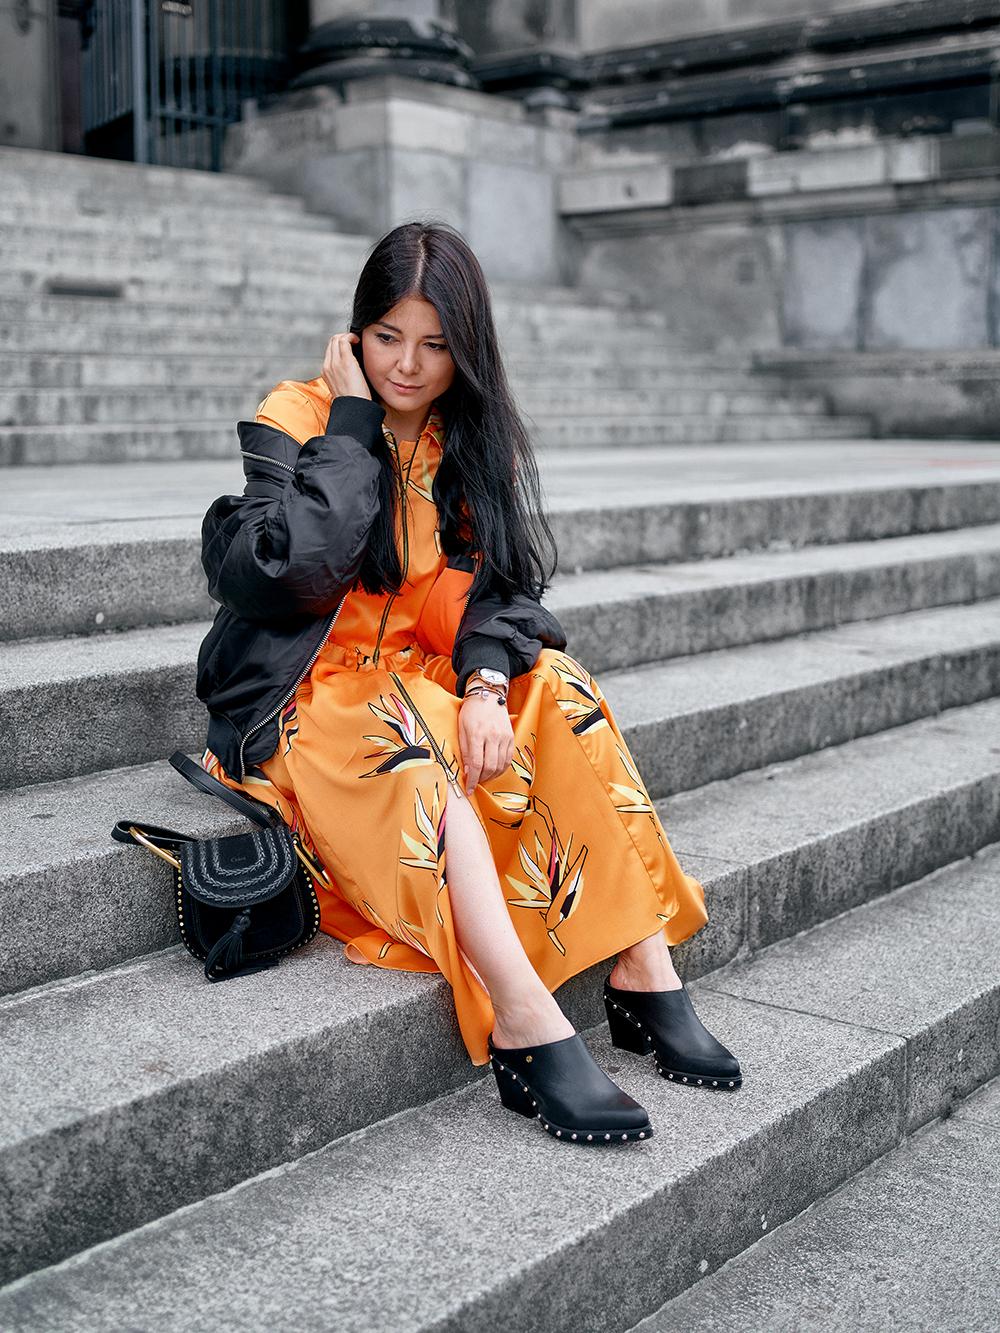 fashionambit-fashionblog-muenchen-modeblog-deutschland-blogger-modeblogger-fashionblogger-bloggerdeutschland-lifestyleblog-munich-style-blog-stilbruch